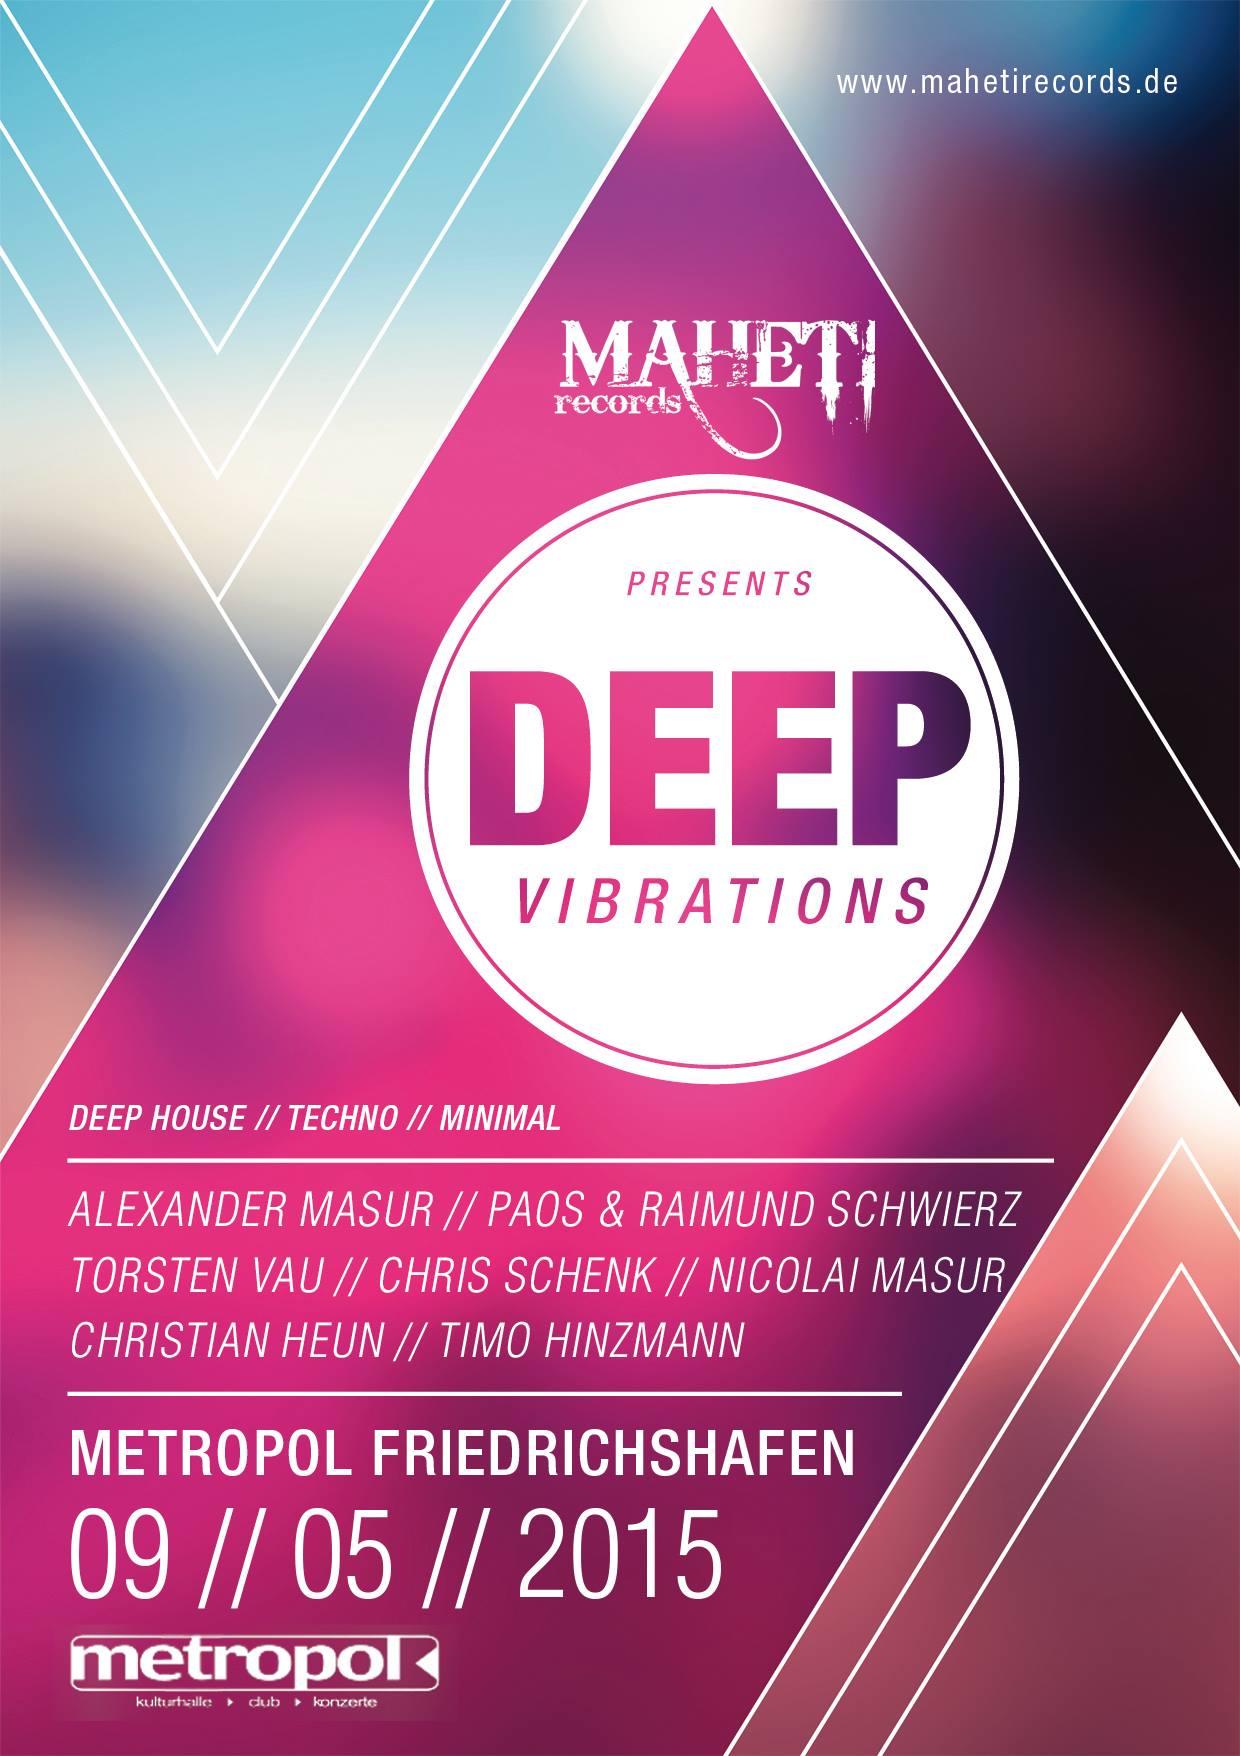 09.05.15 Deep Vibrations @ Metropol, Friedrichshafen